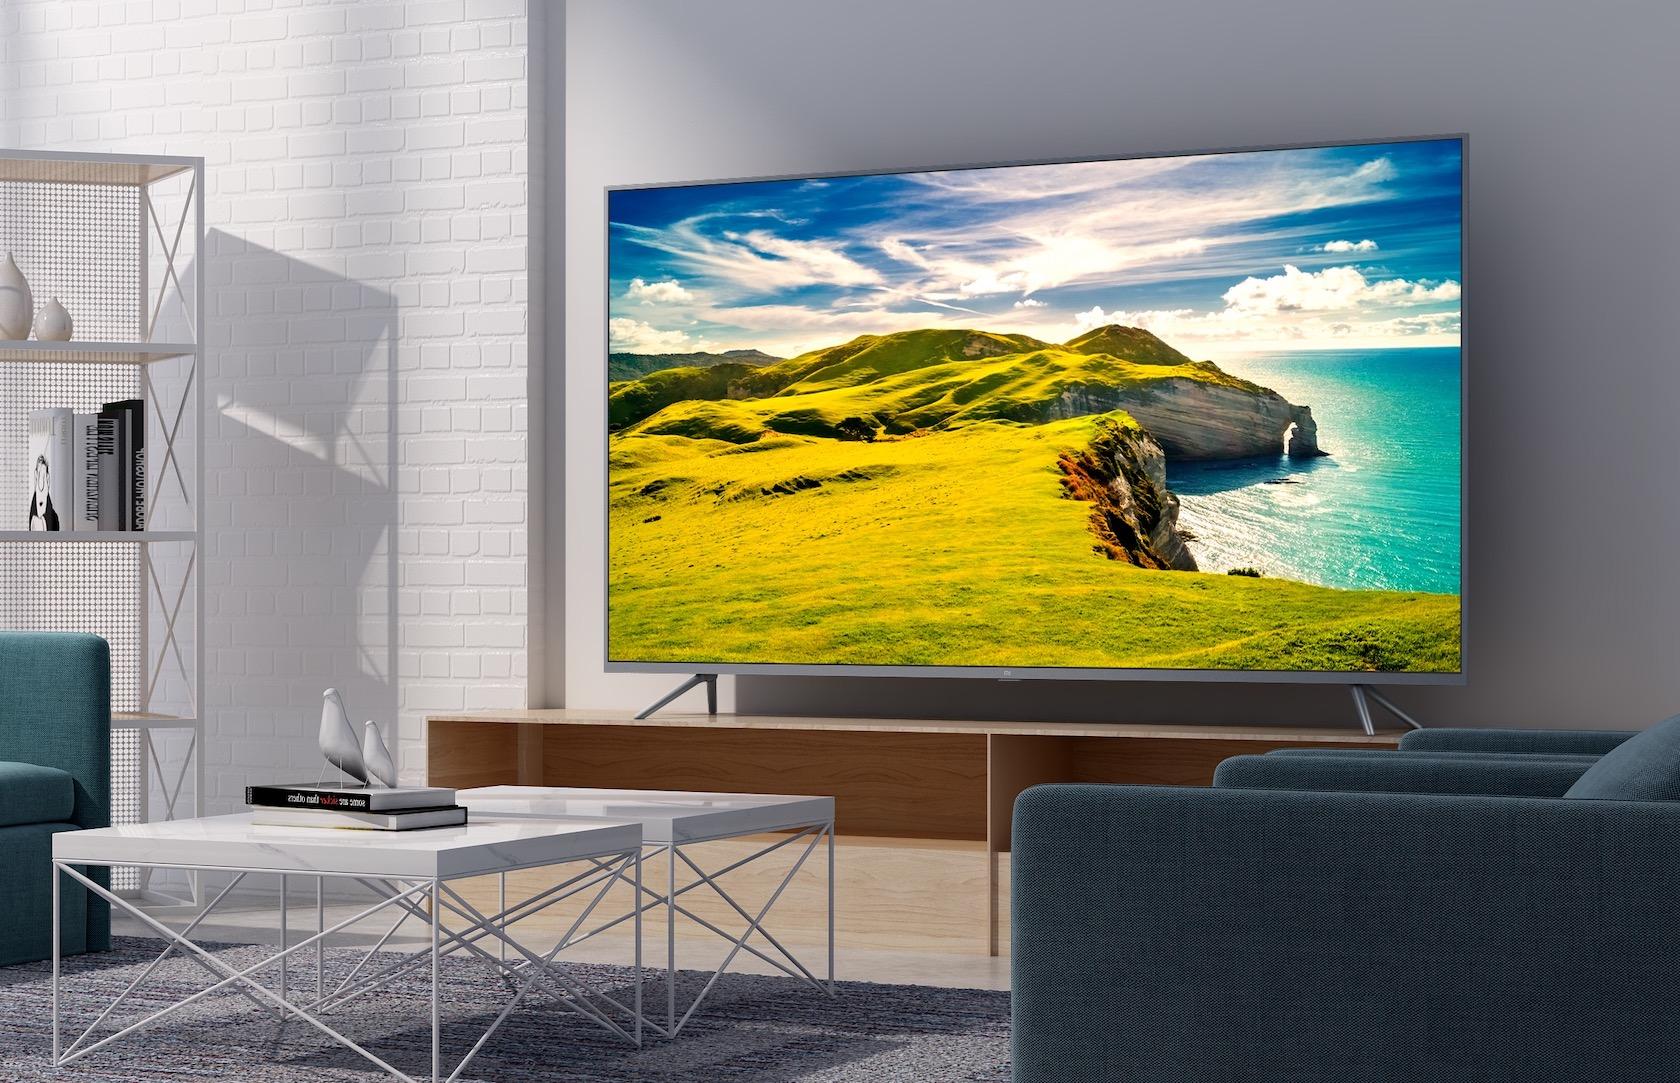 Xiaomi Mi TV 4S 65 U2033 Is A 4K Smart TV Worth Getting Jealous